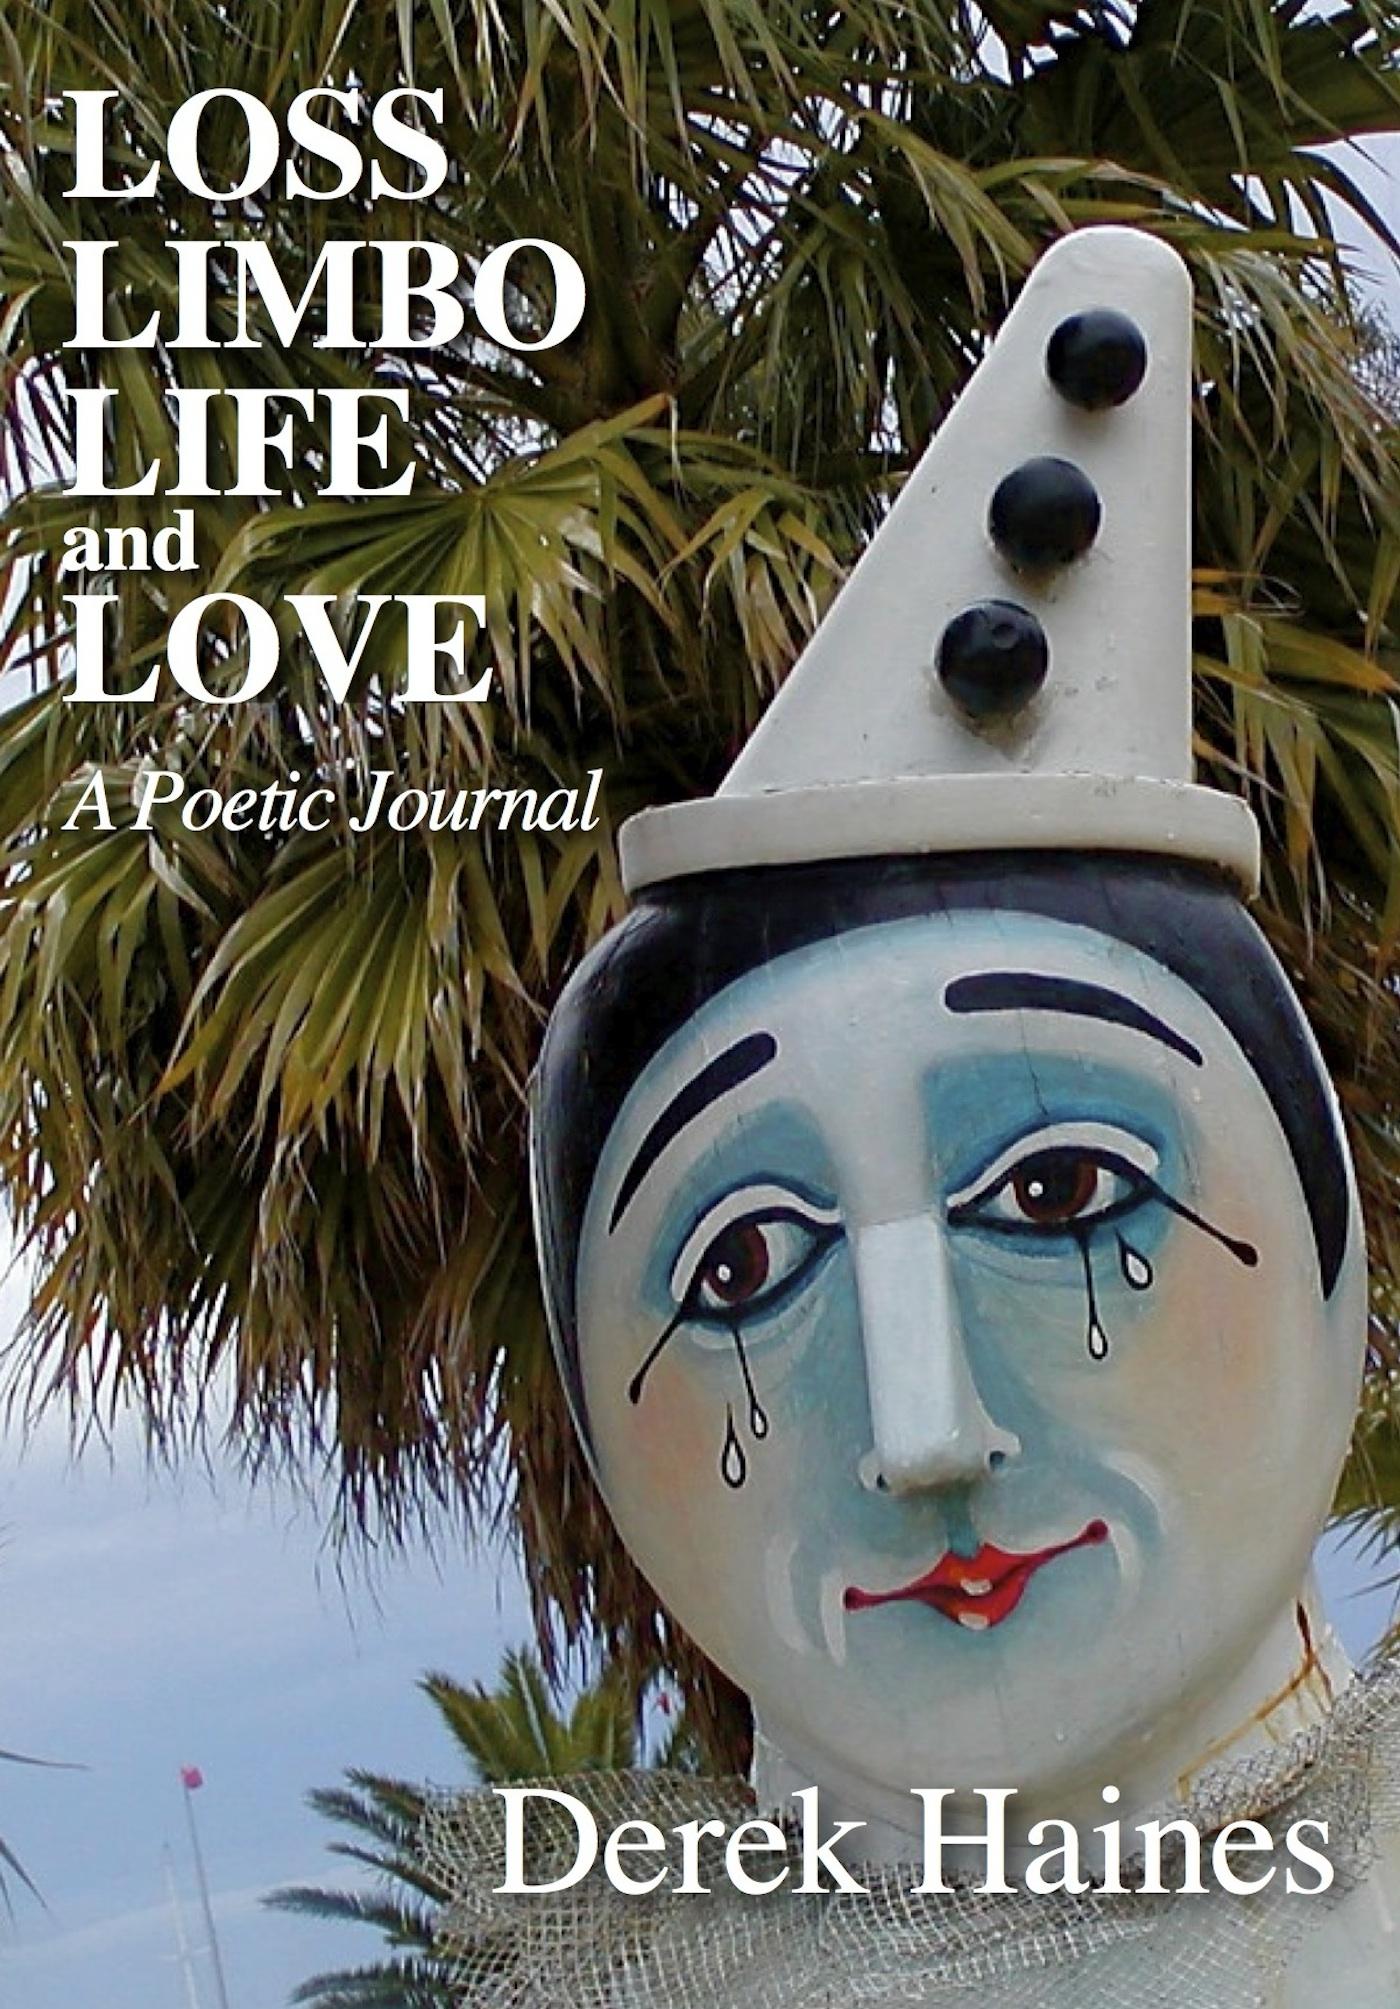 Derek Haines - Loss, Limbo, Life and Love